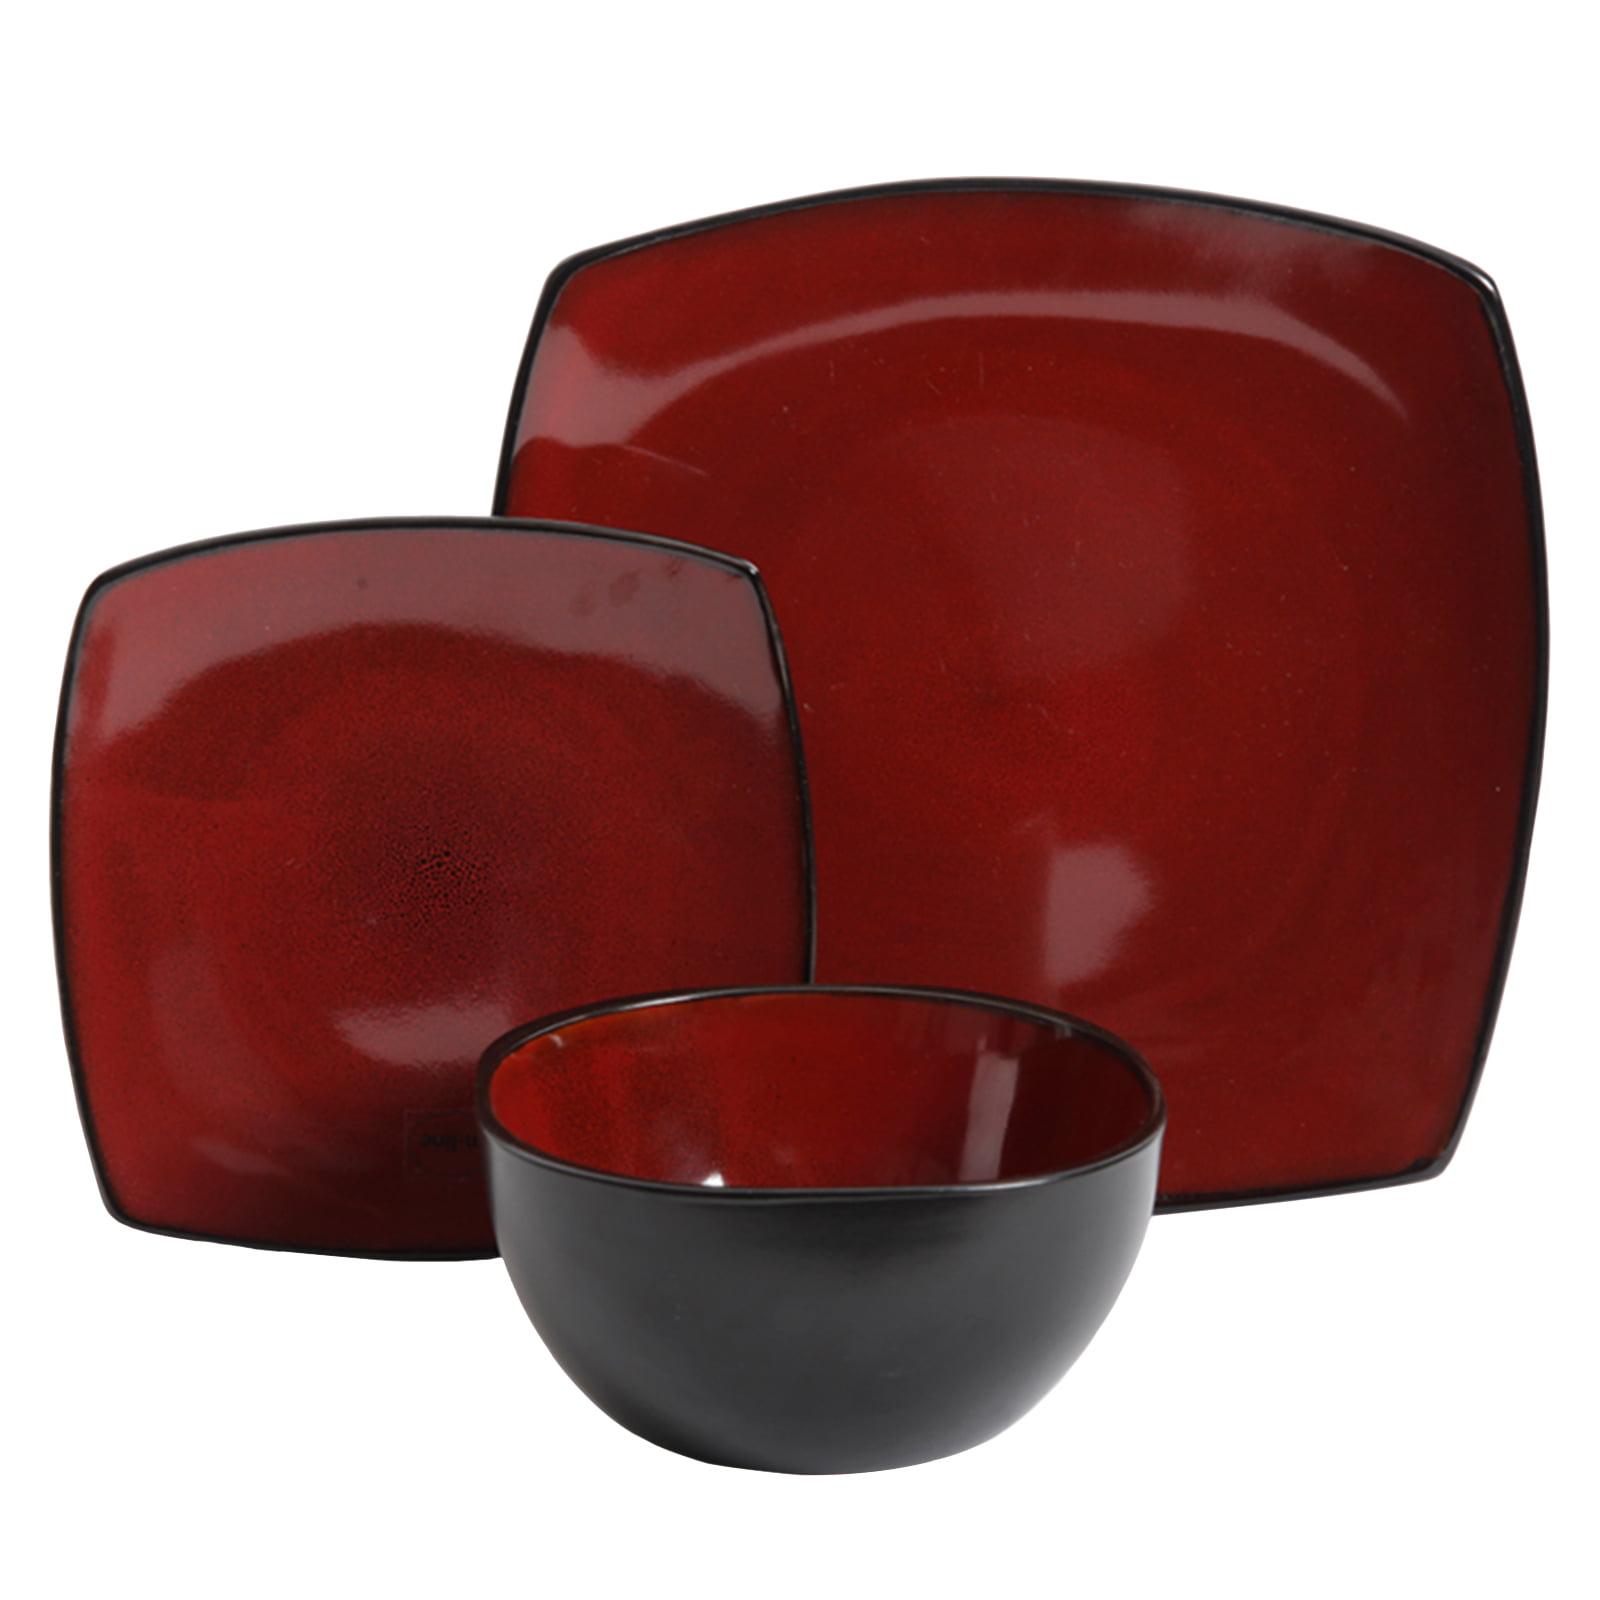 Soho Lounge 12-Piece Soft Square Dinnerware Set, Red